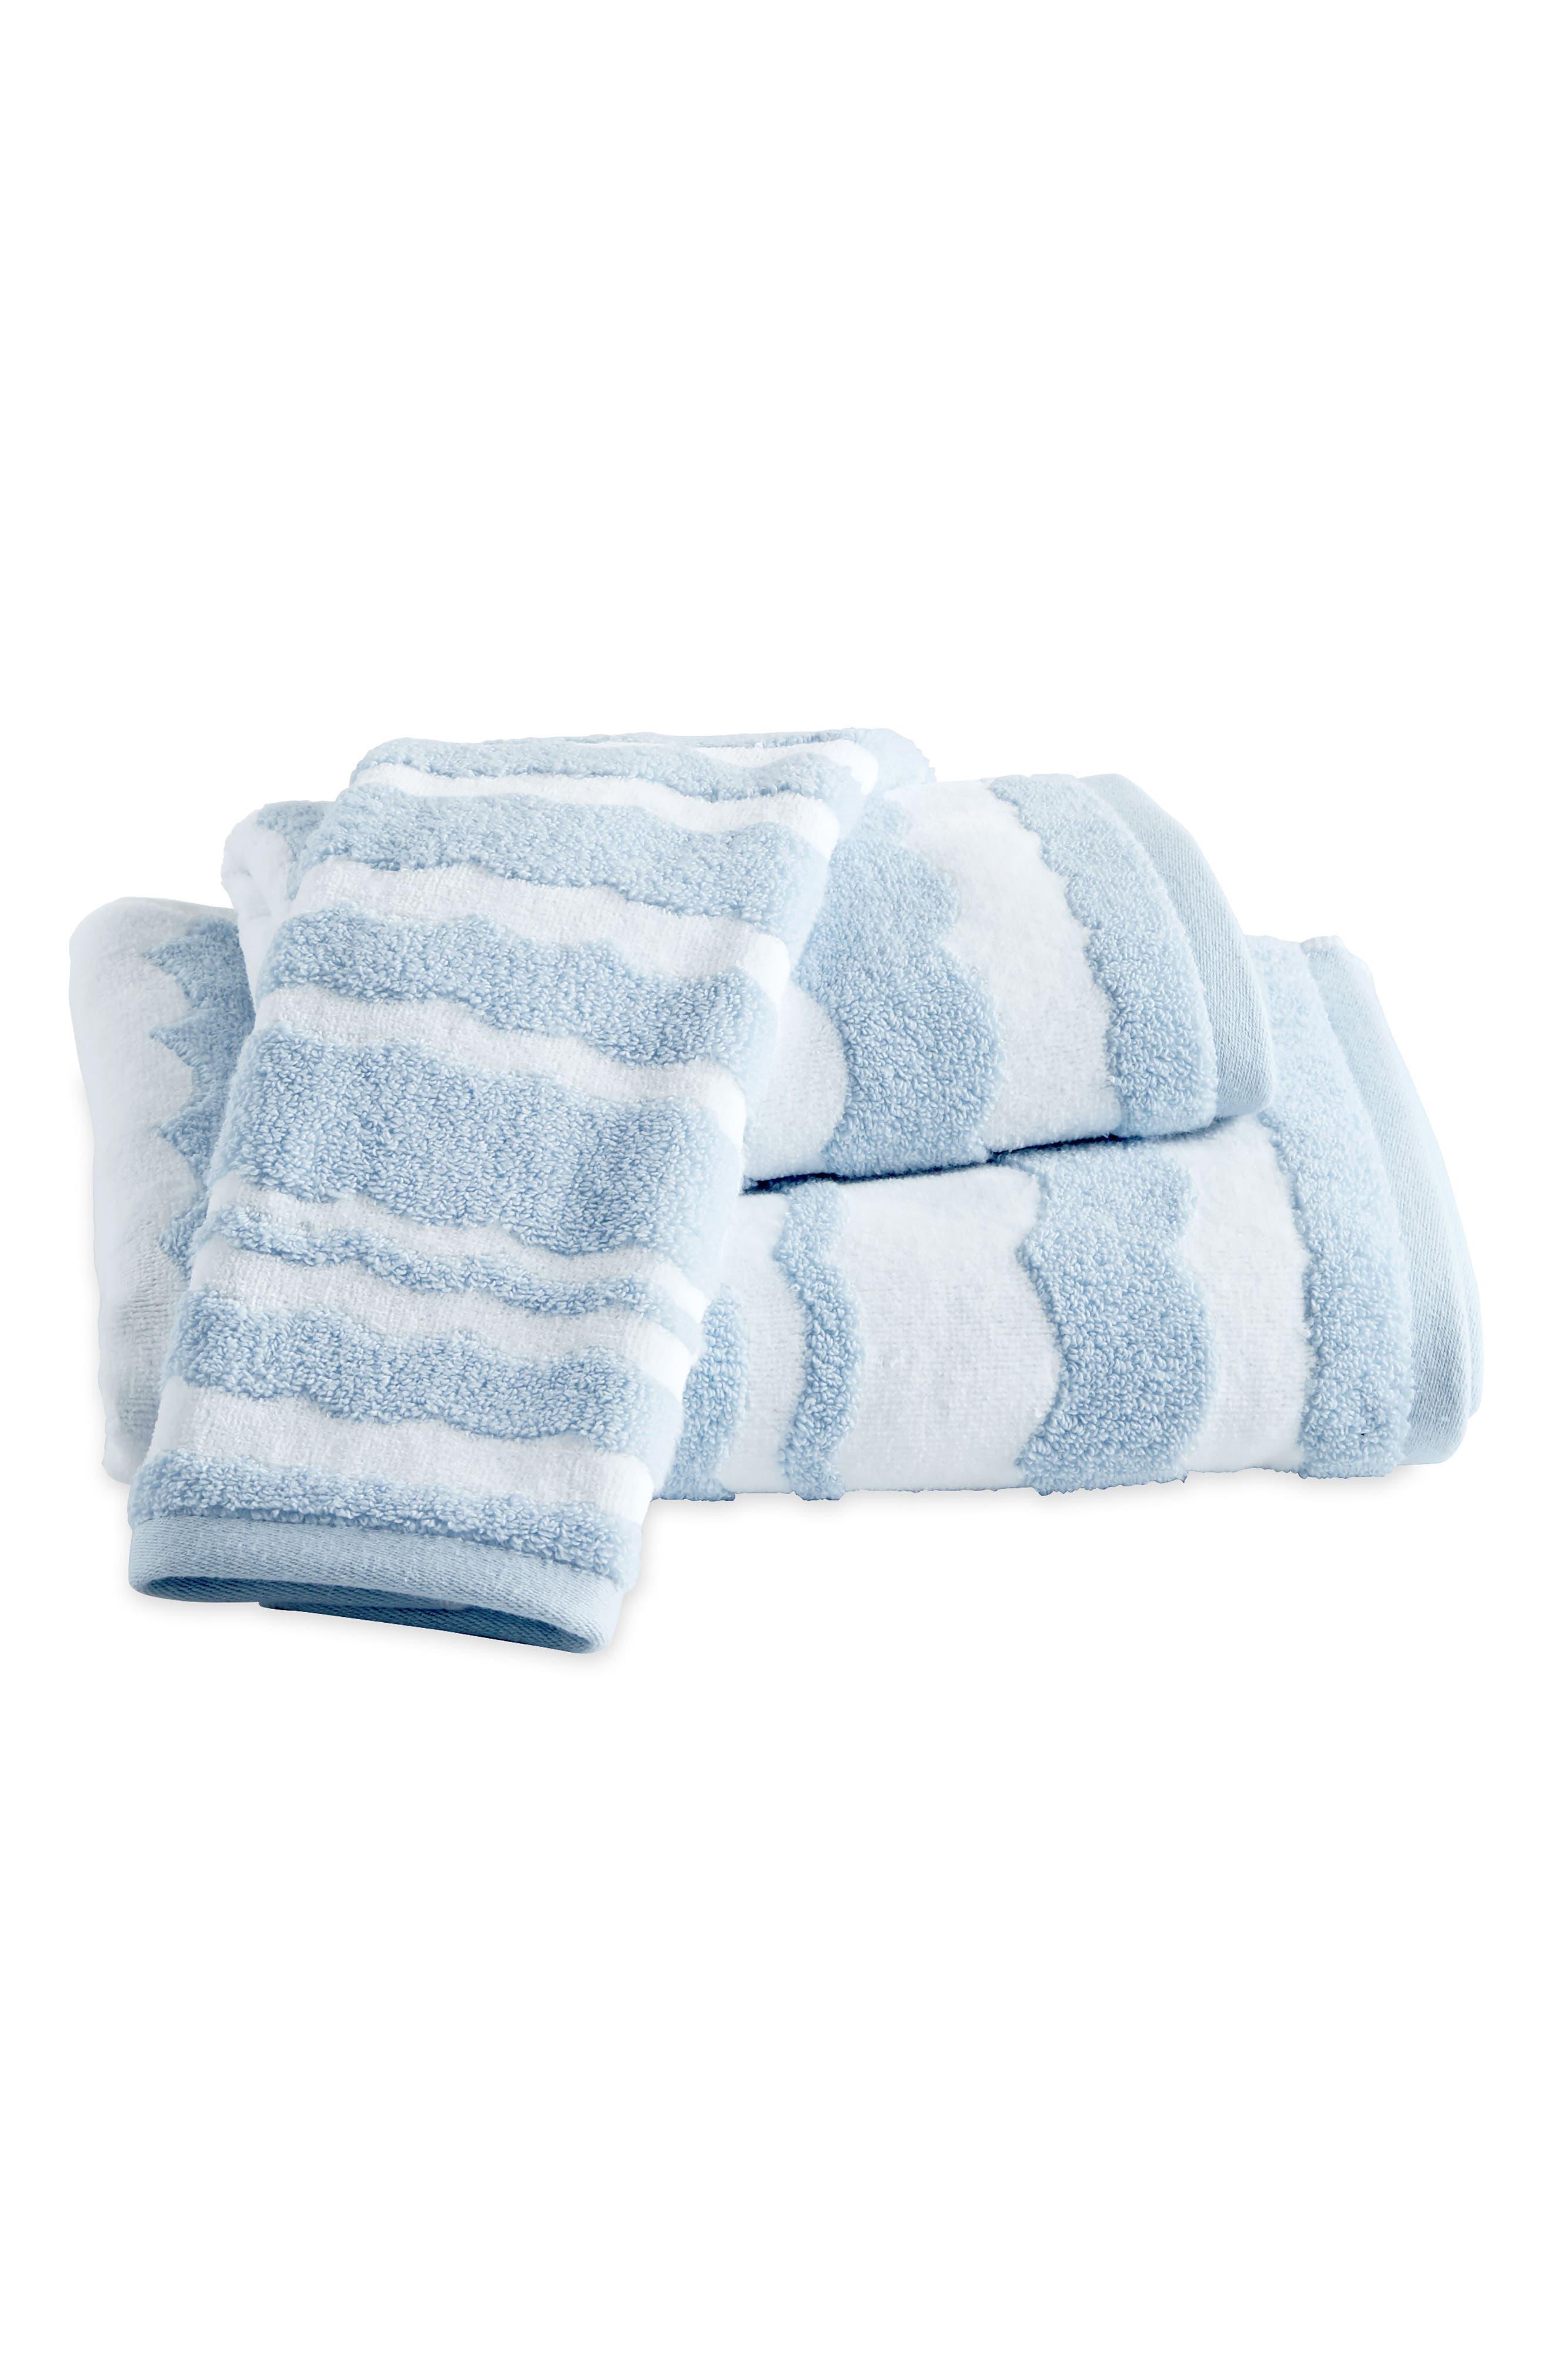 Wave Scallop Bath Towel, Hand Towel and Tip Towel Set,                             Main thumbnail 1, color,                             400